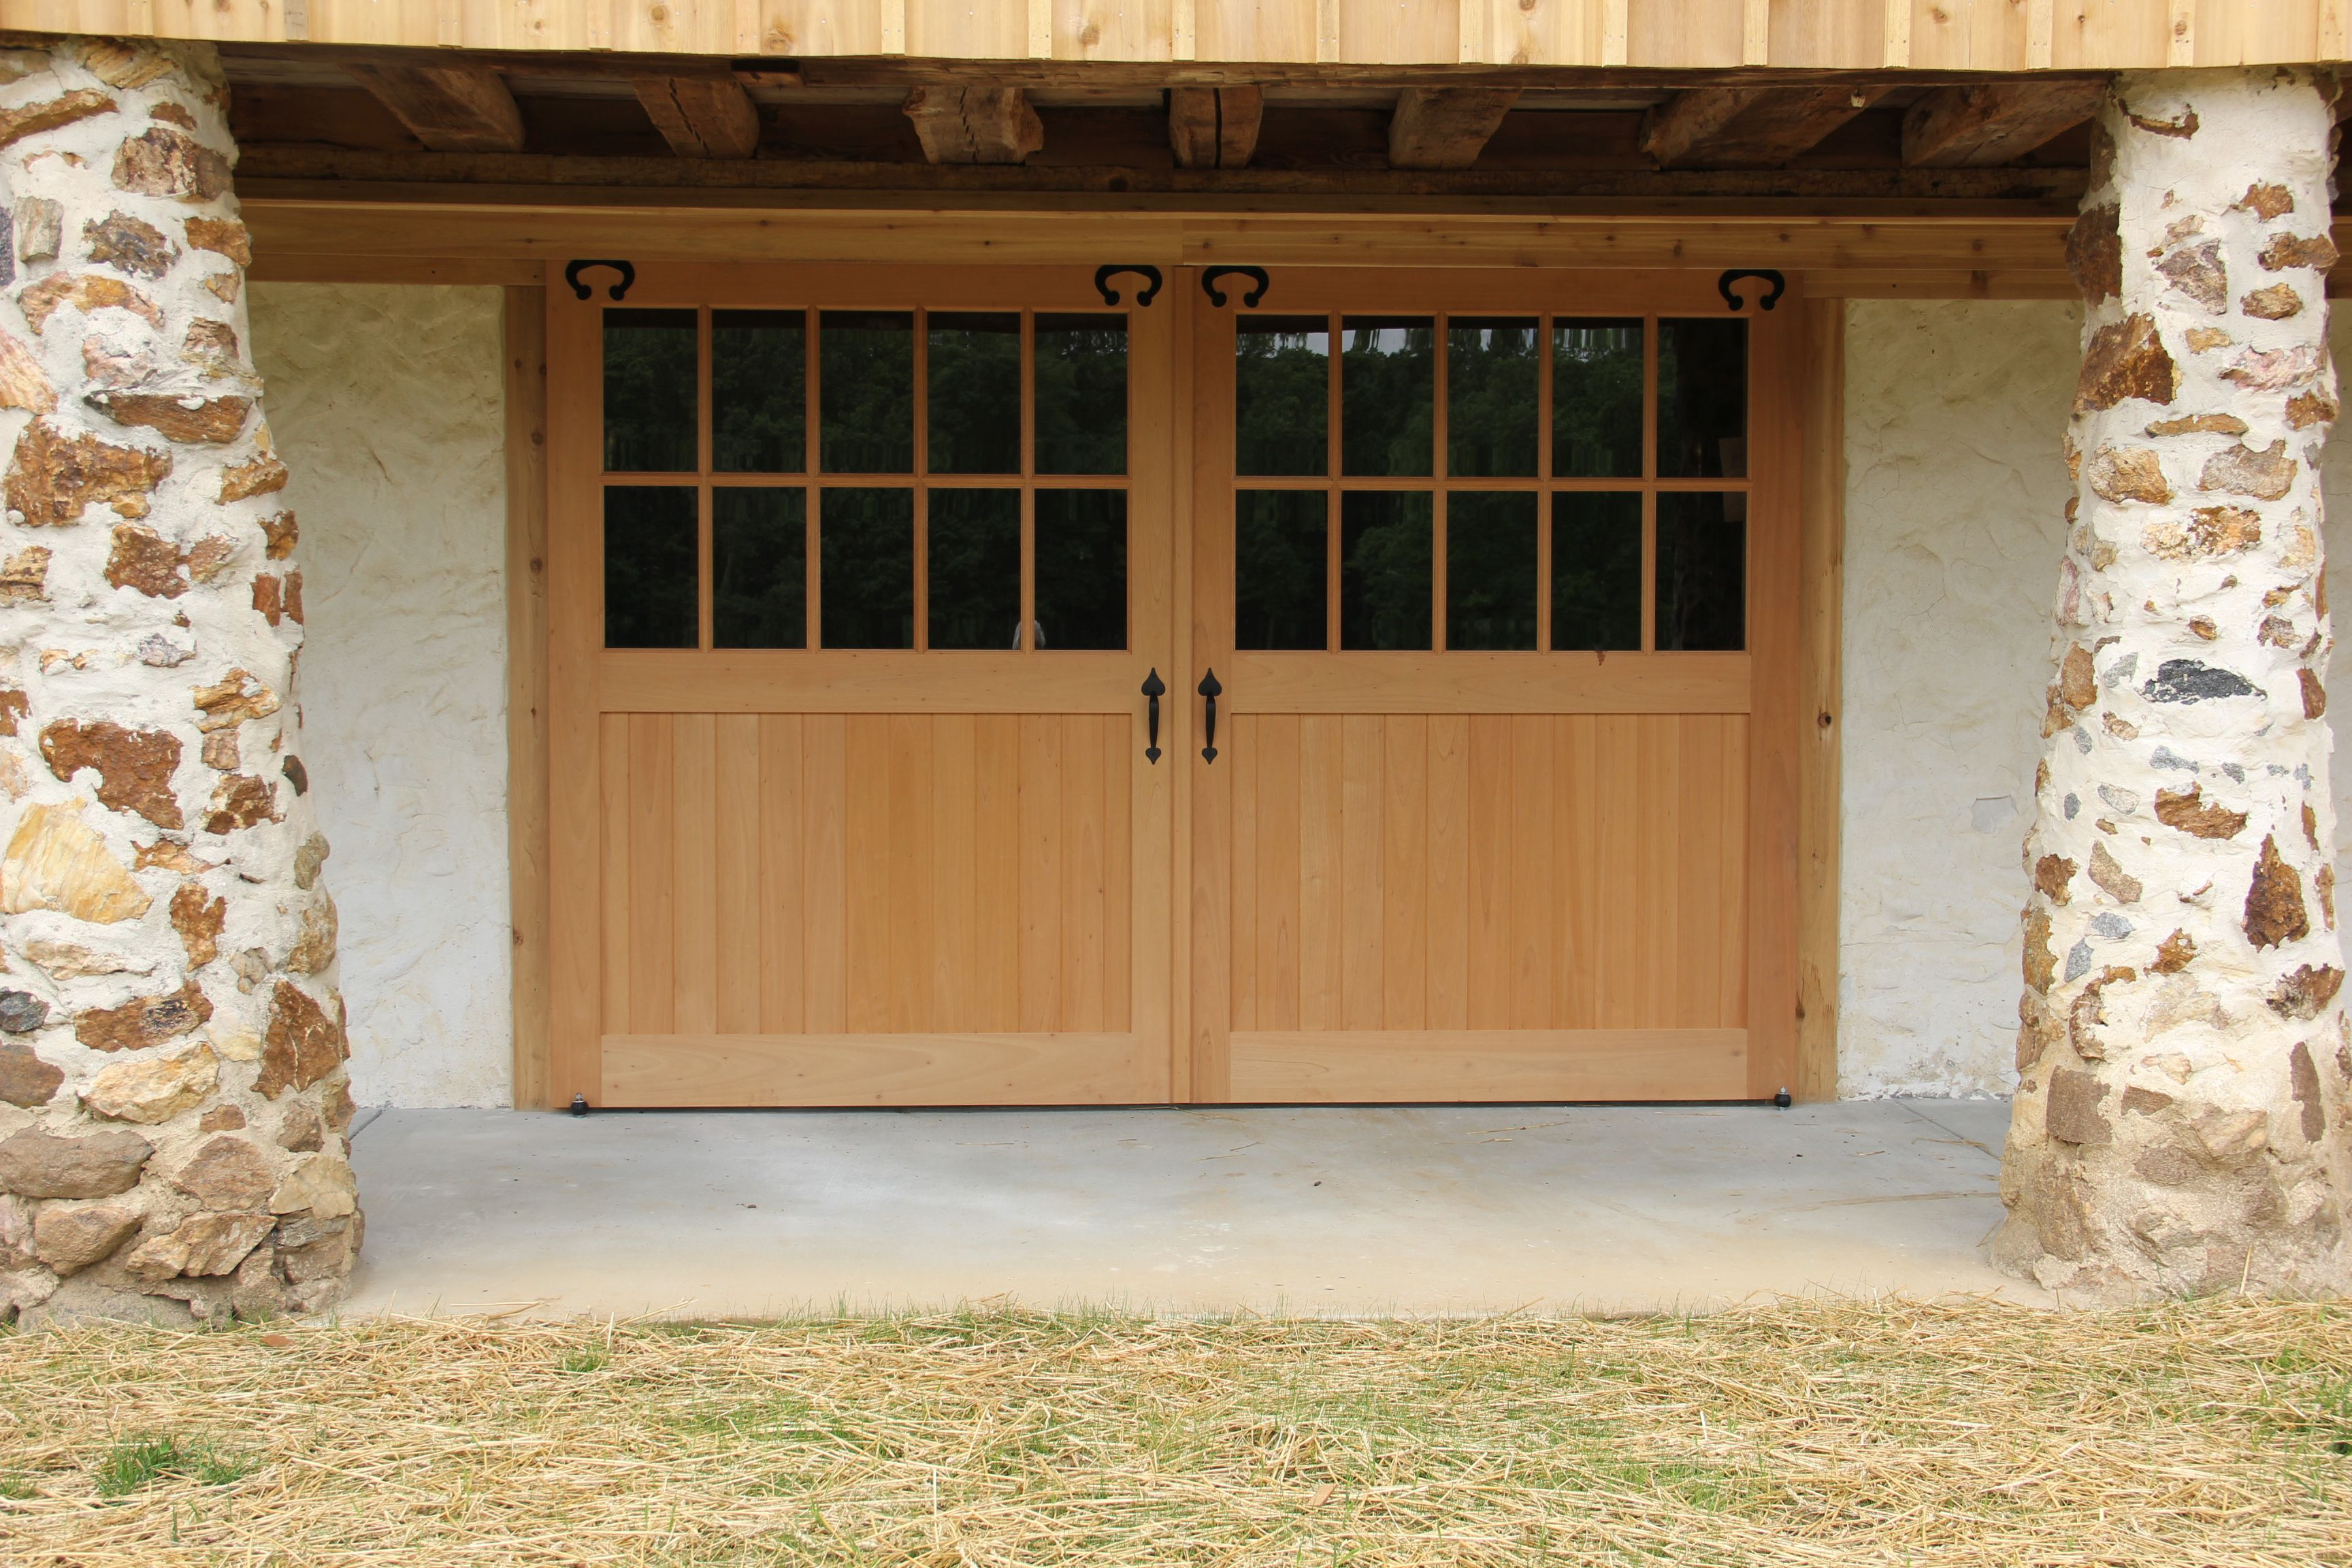 Pin By King Construction Co Llc On Horse Barn Doors Windows Barn Door Window Outdoor Decor Outdoor